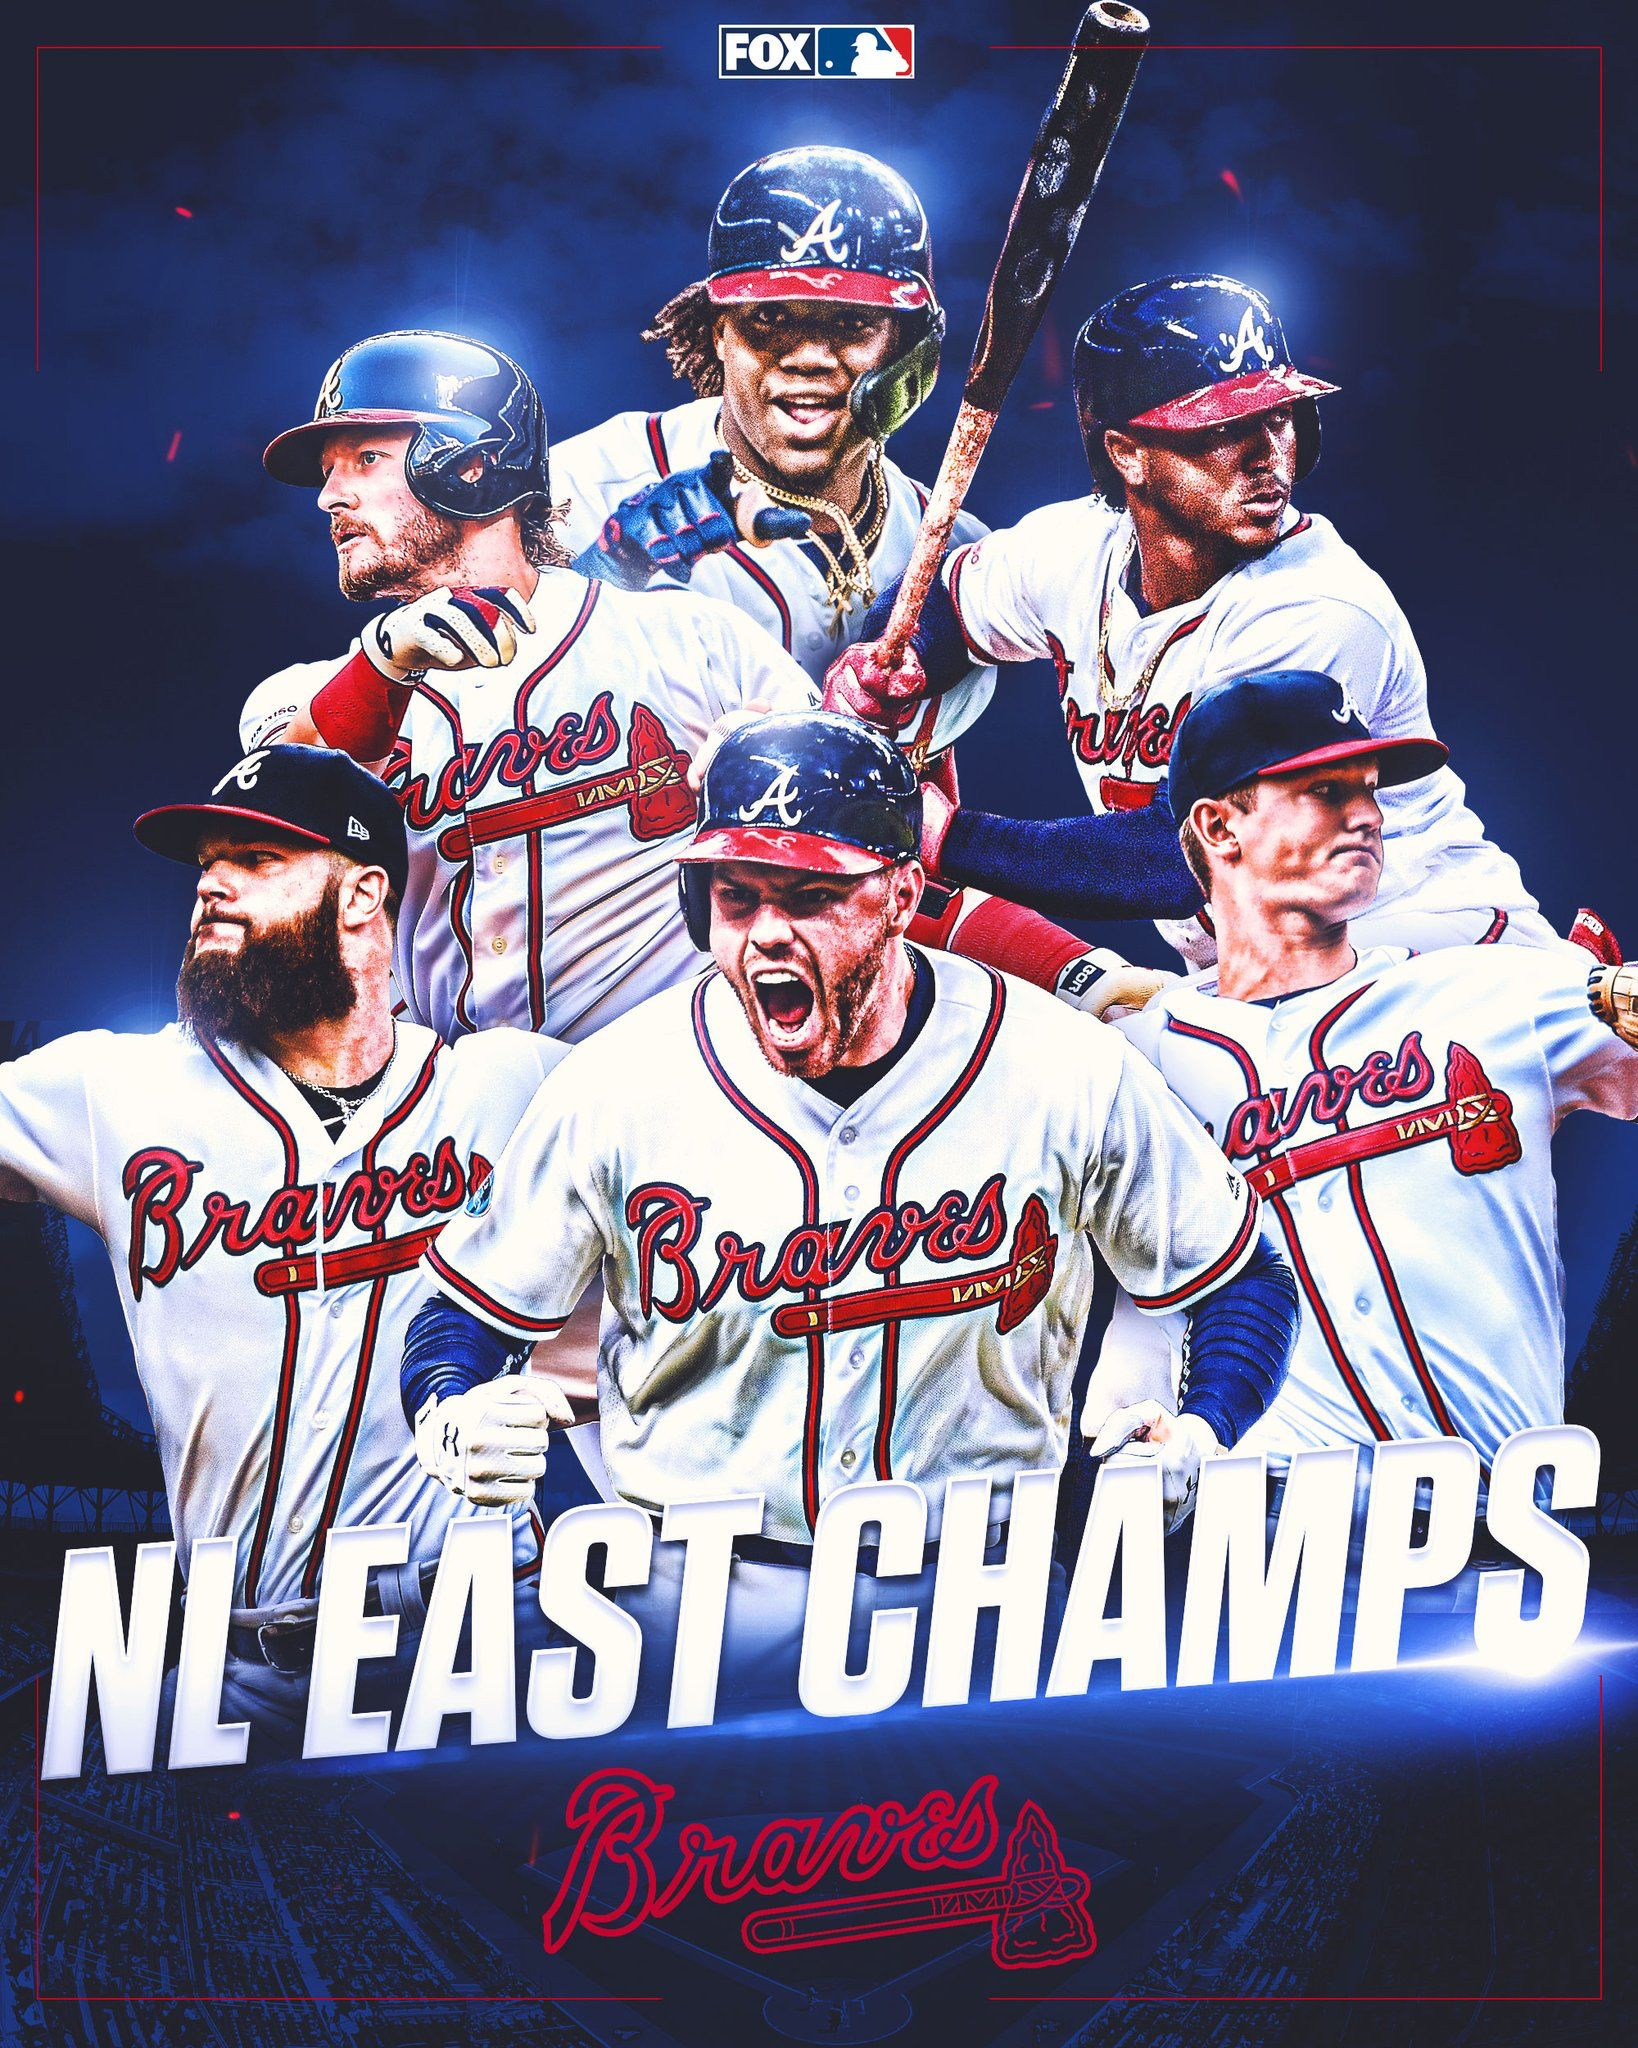 Pin By Dani Houck On Baseball Atlanta Braves Atlanta Braves Baseball Braves